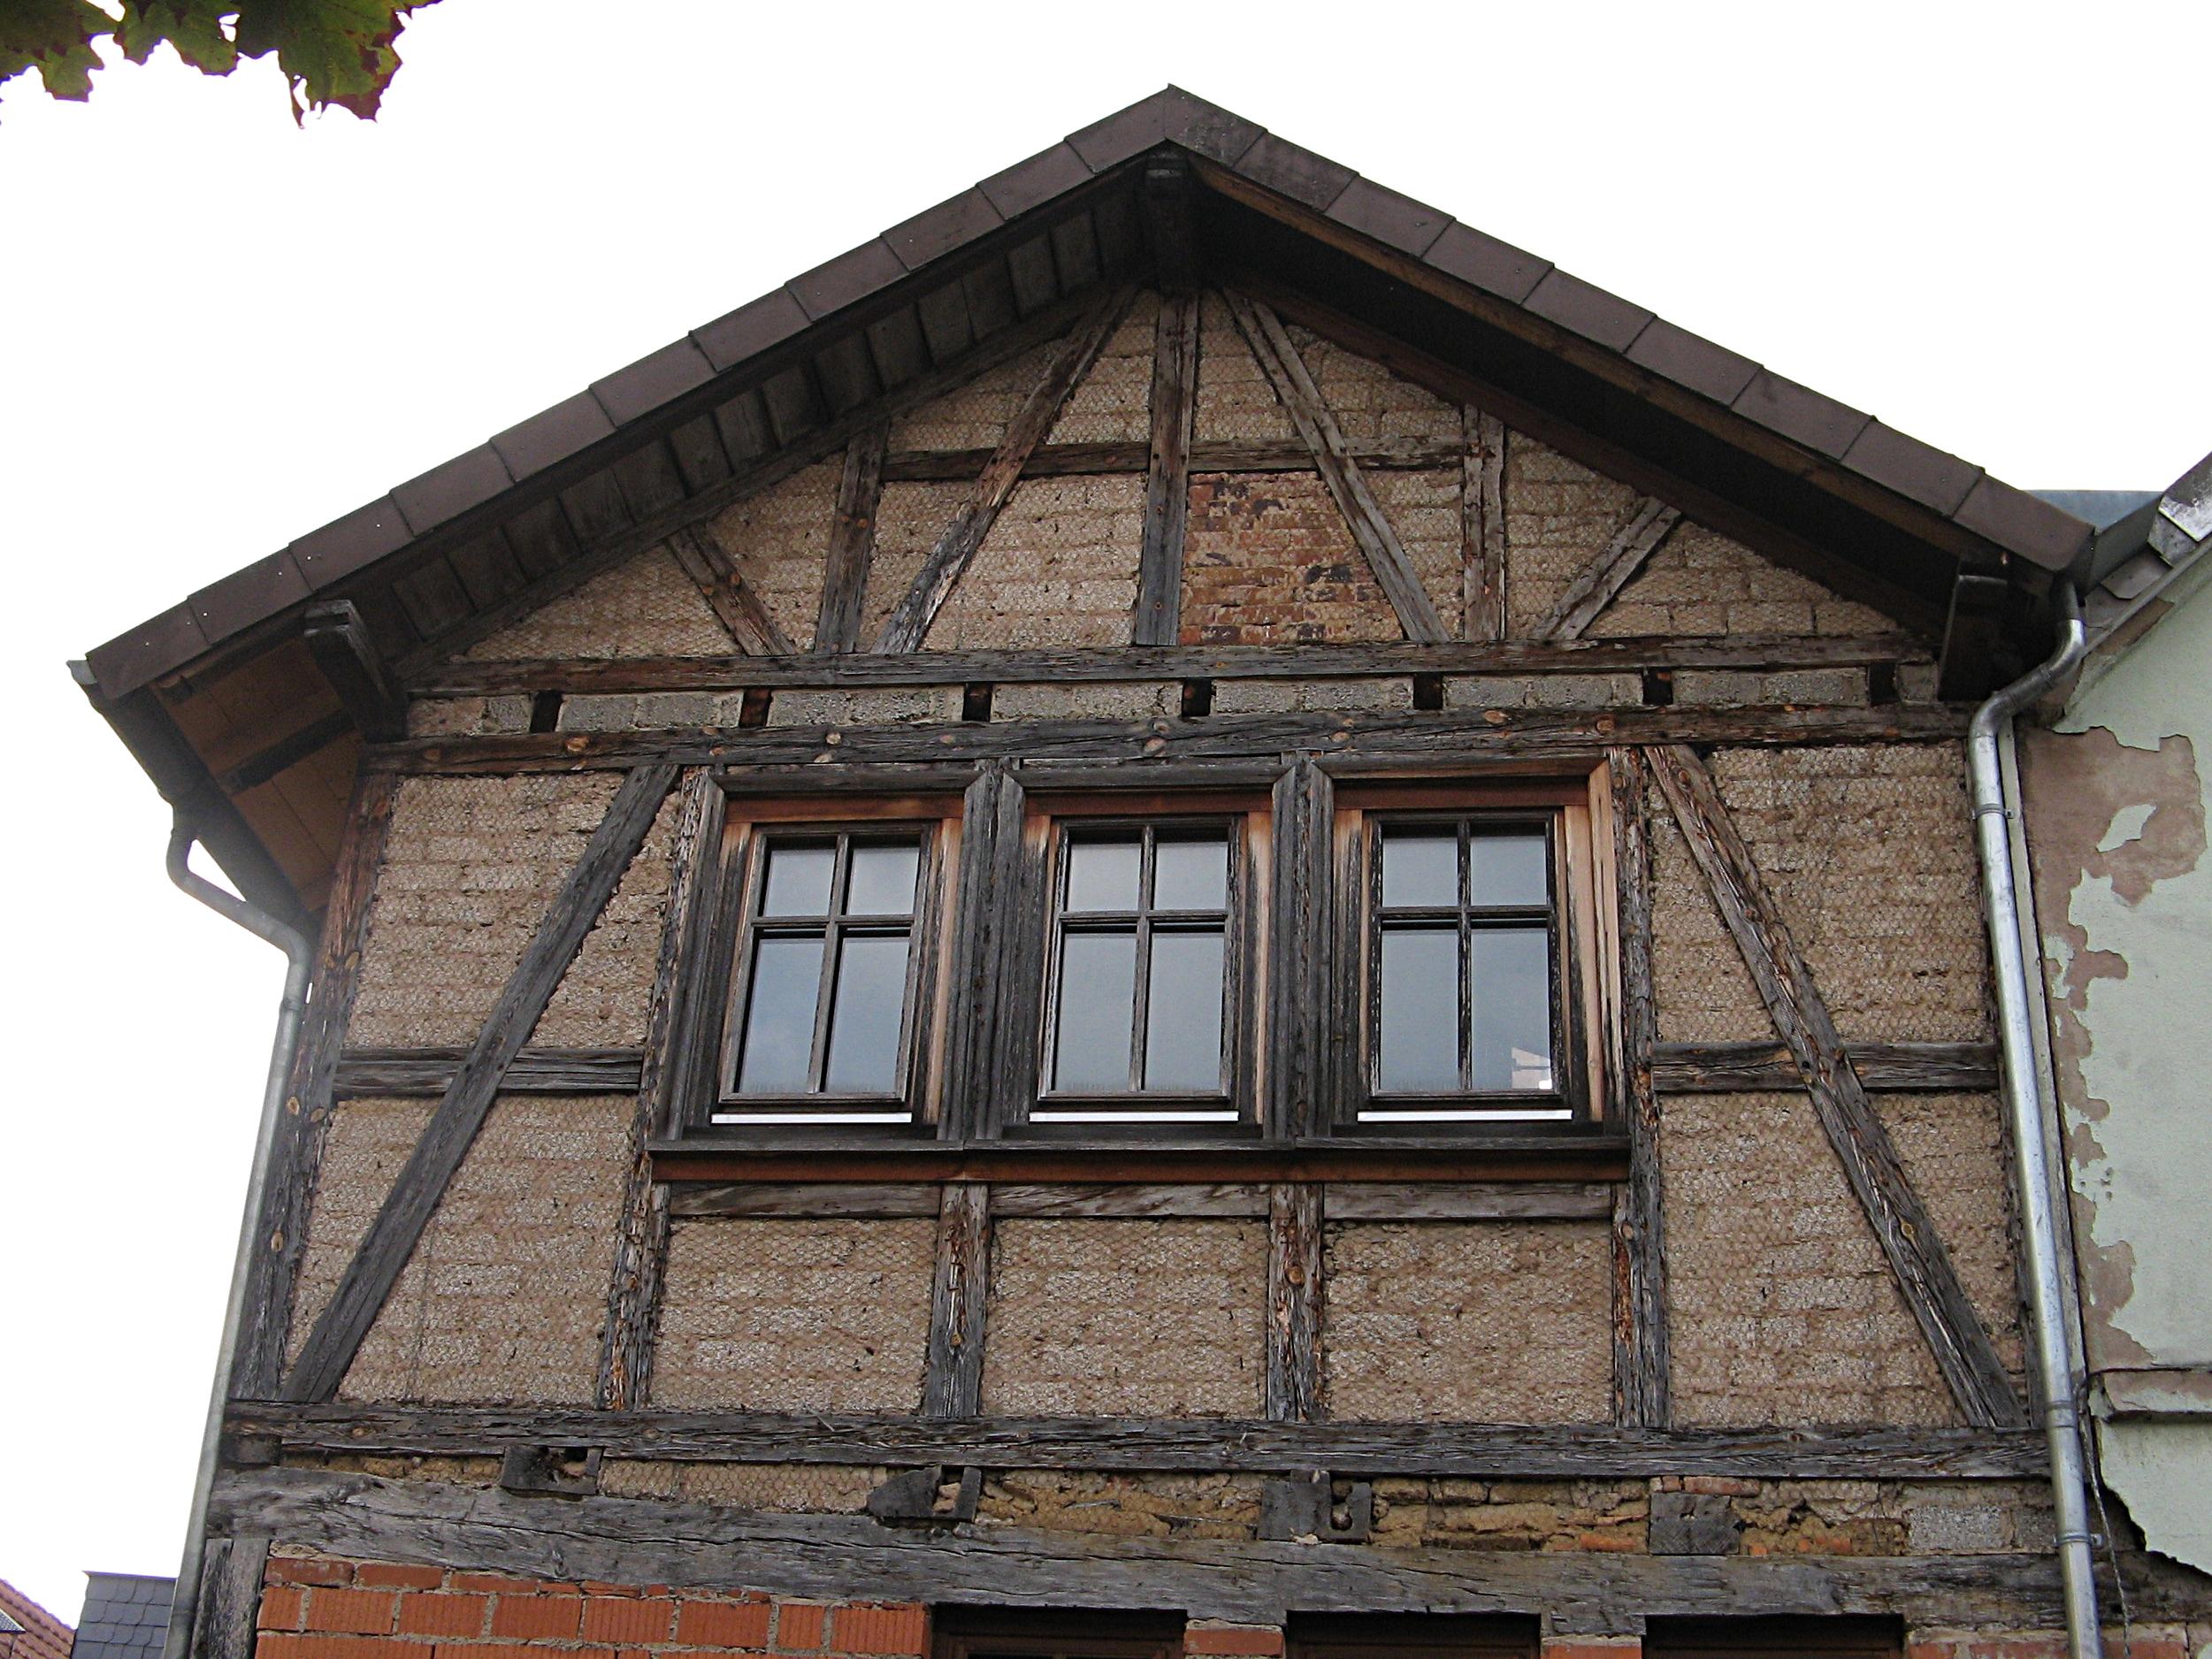 File:Fachwerkhaus - Giebelwand.jpg - Wikimedia Commons